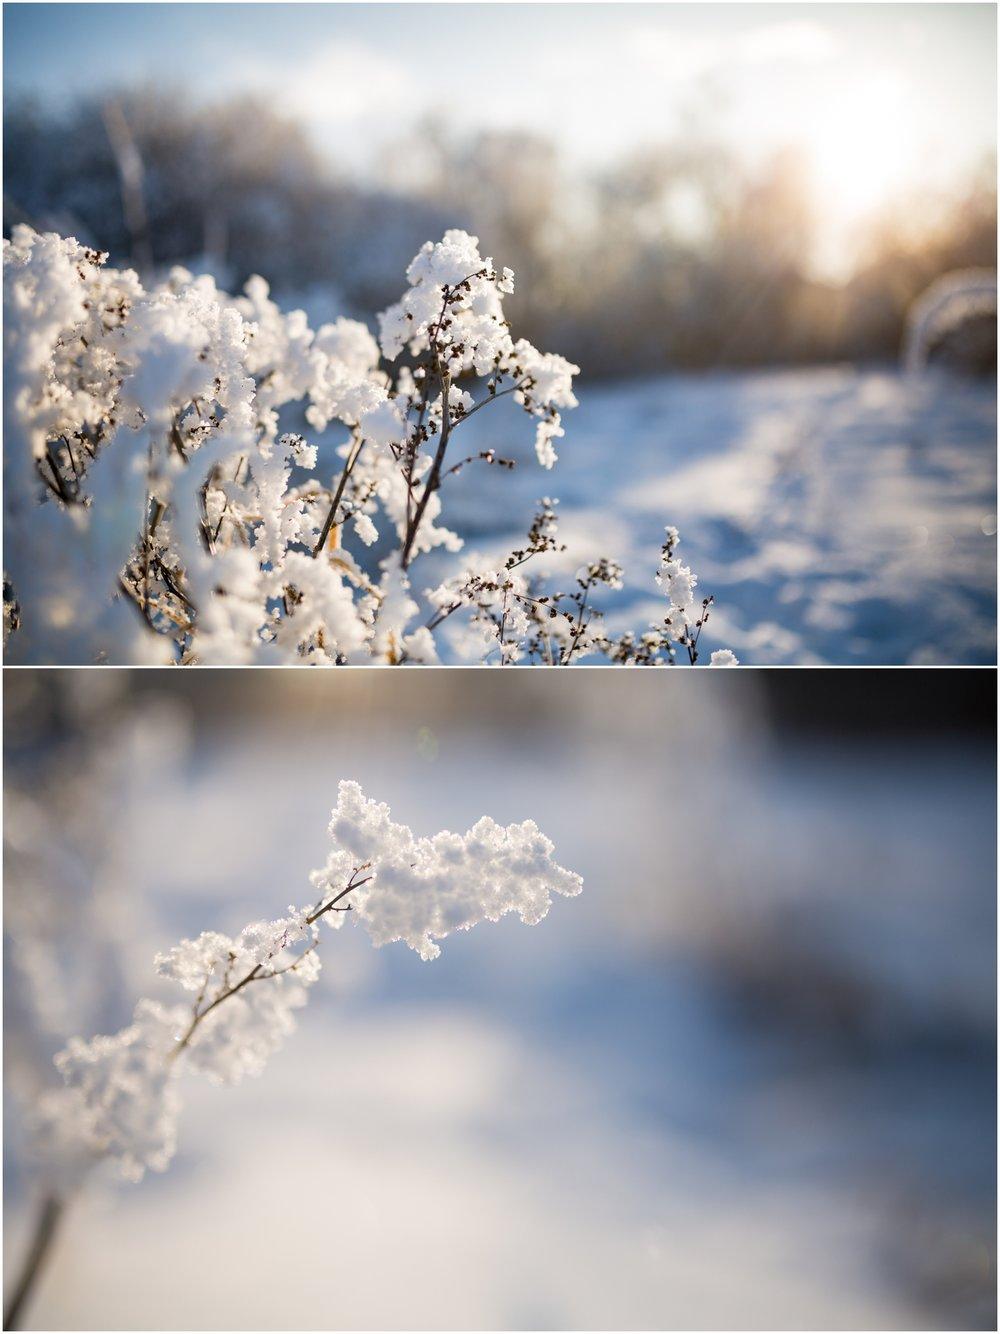 Treelines Photography - Edmonton Landscape Photographer - Edmonton Hoar Frost - YEG Winter